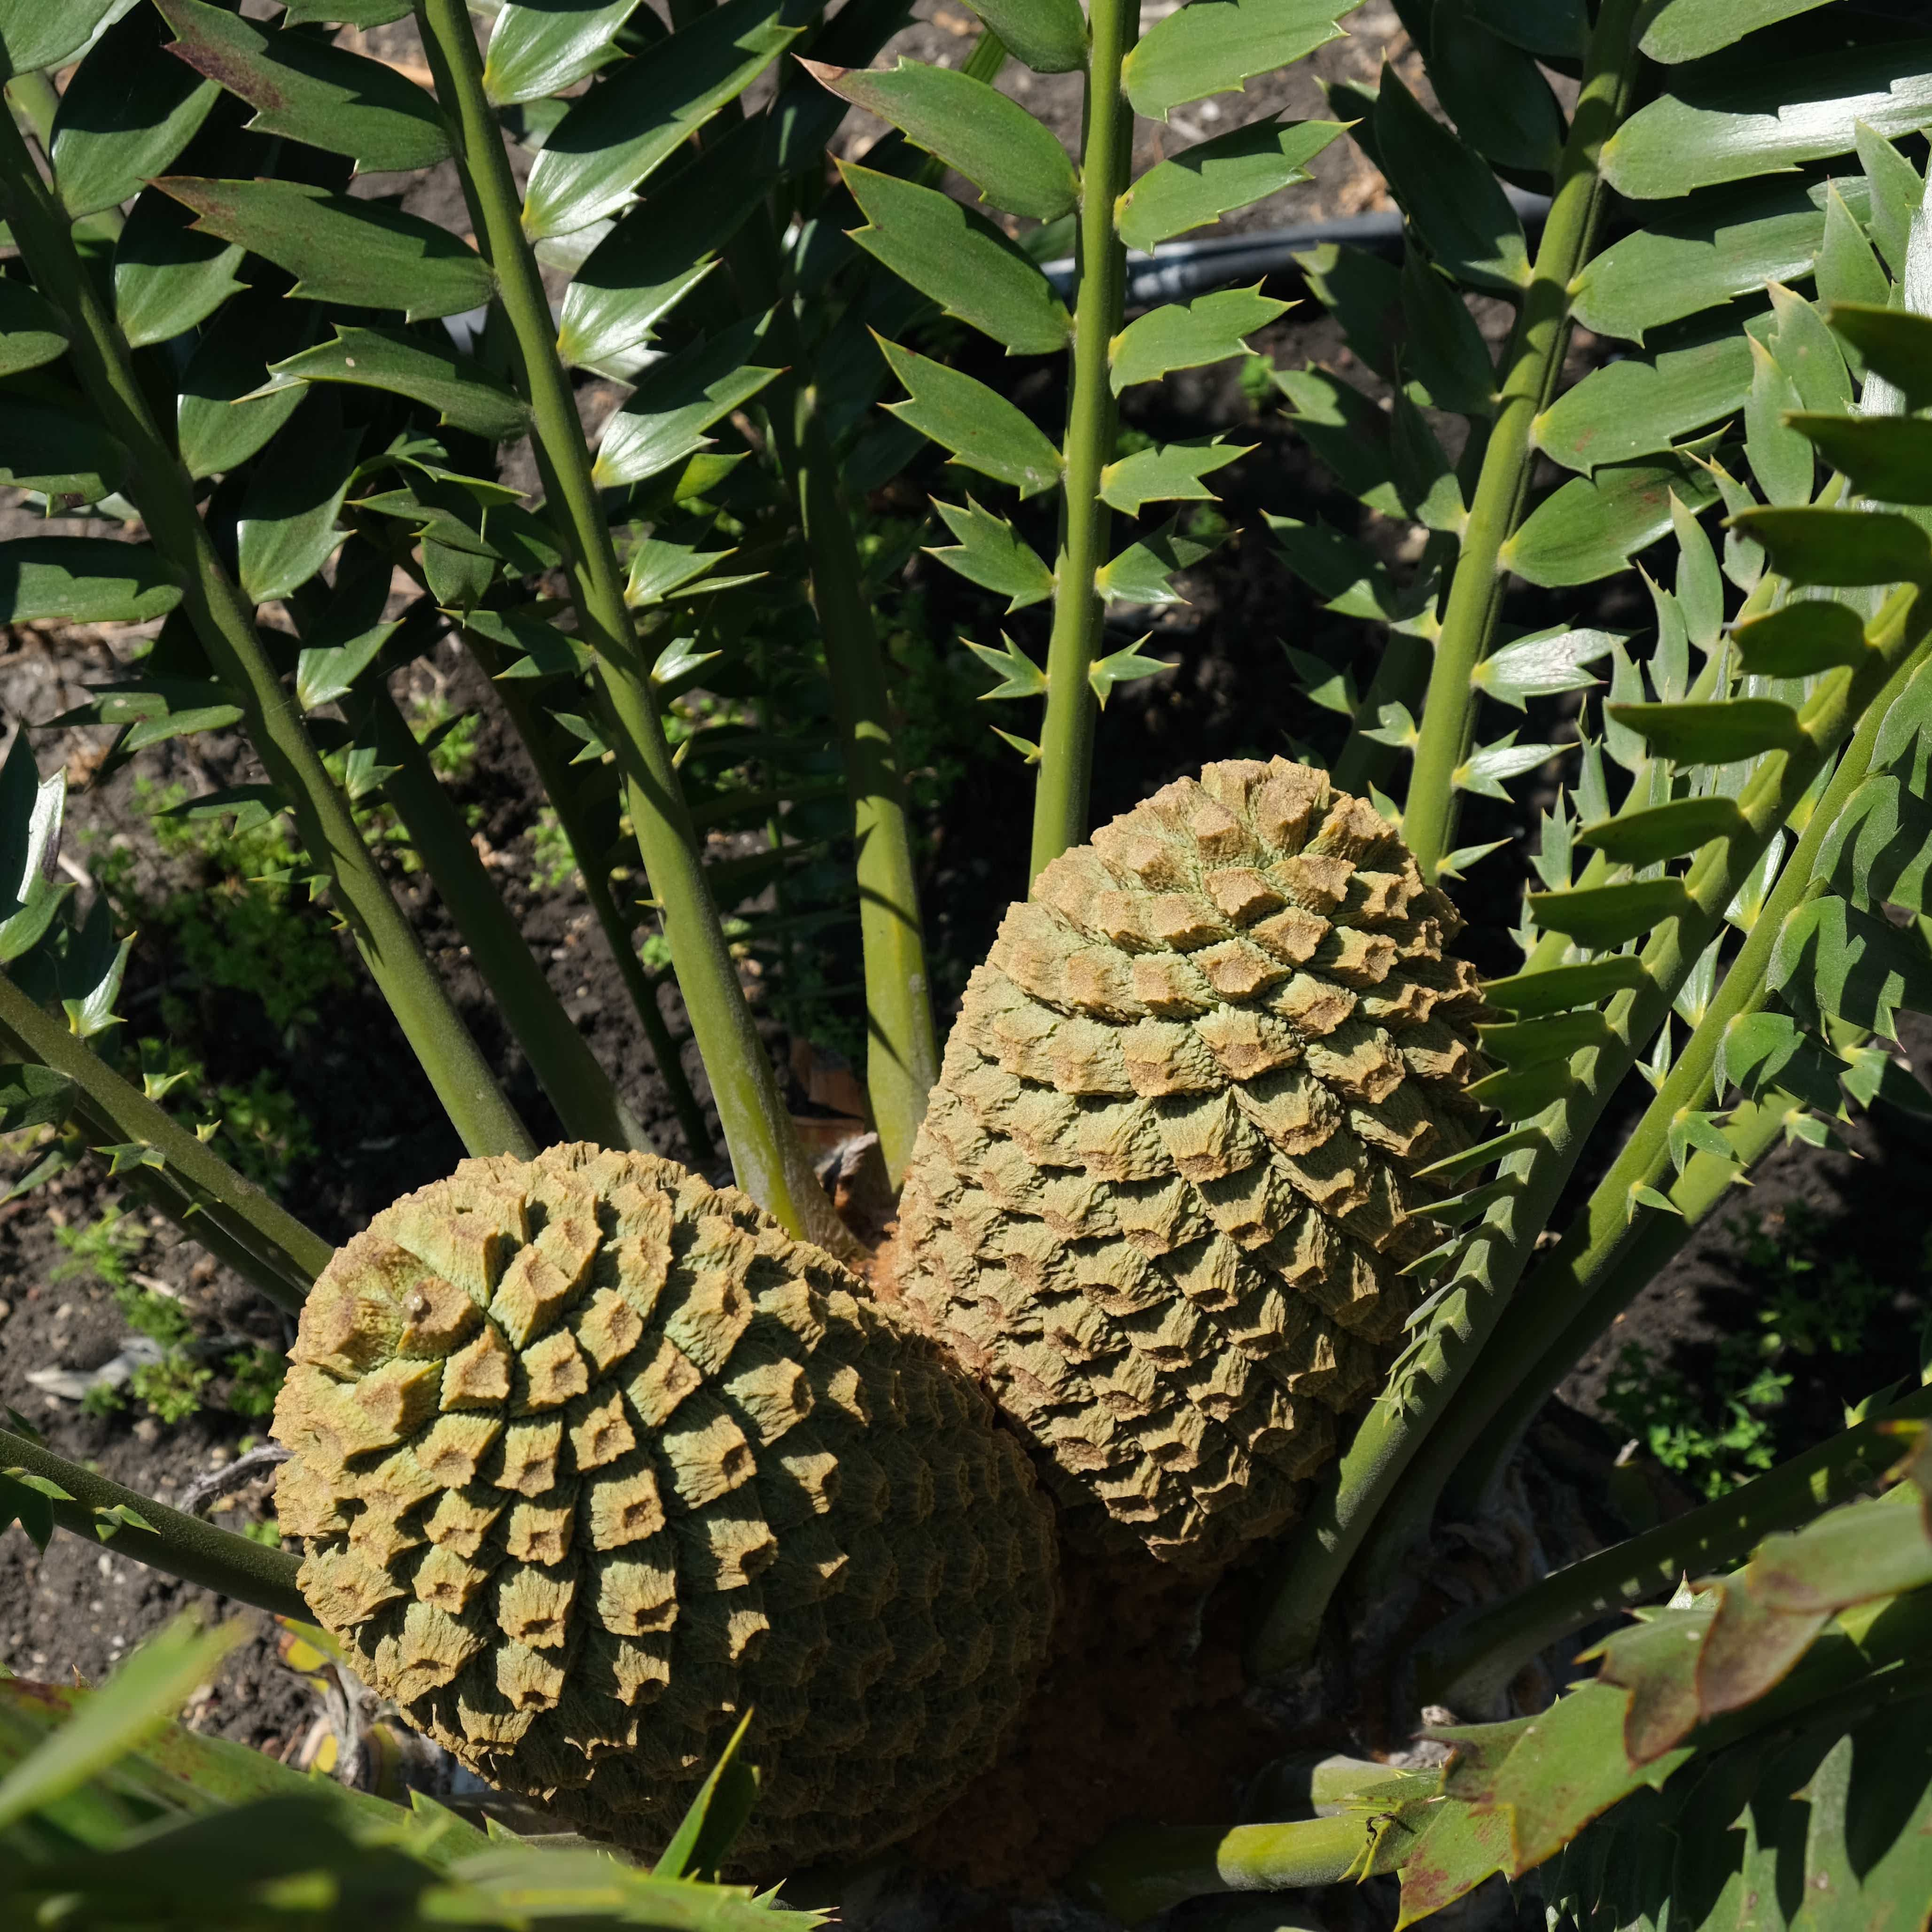 Encephalartos transvenosus x latifrons